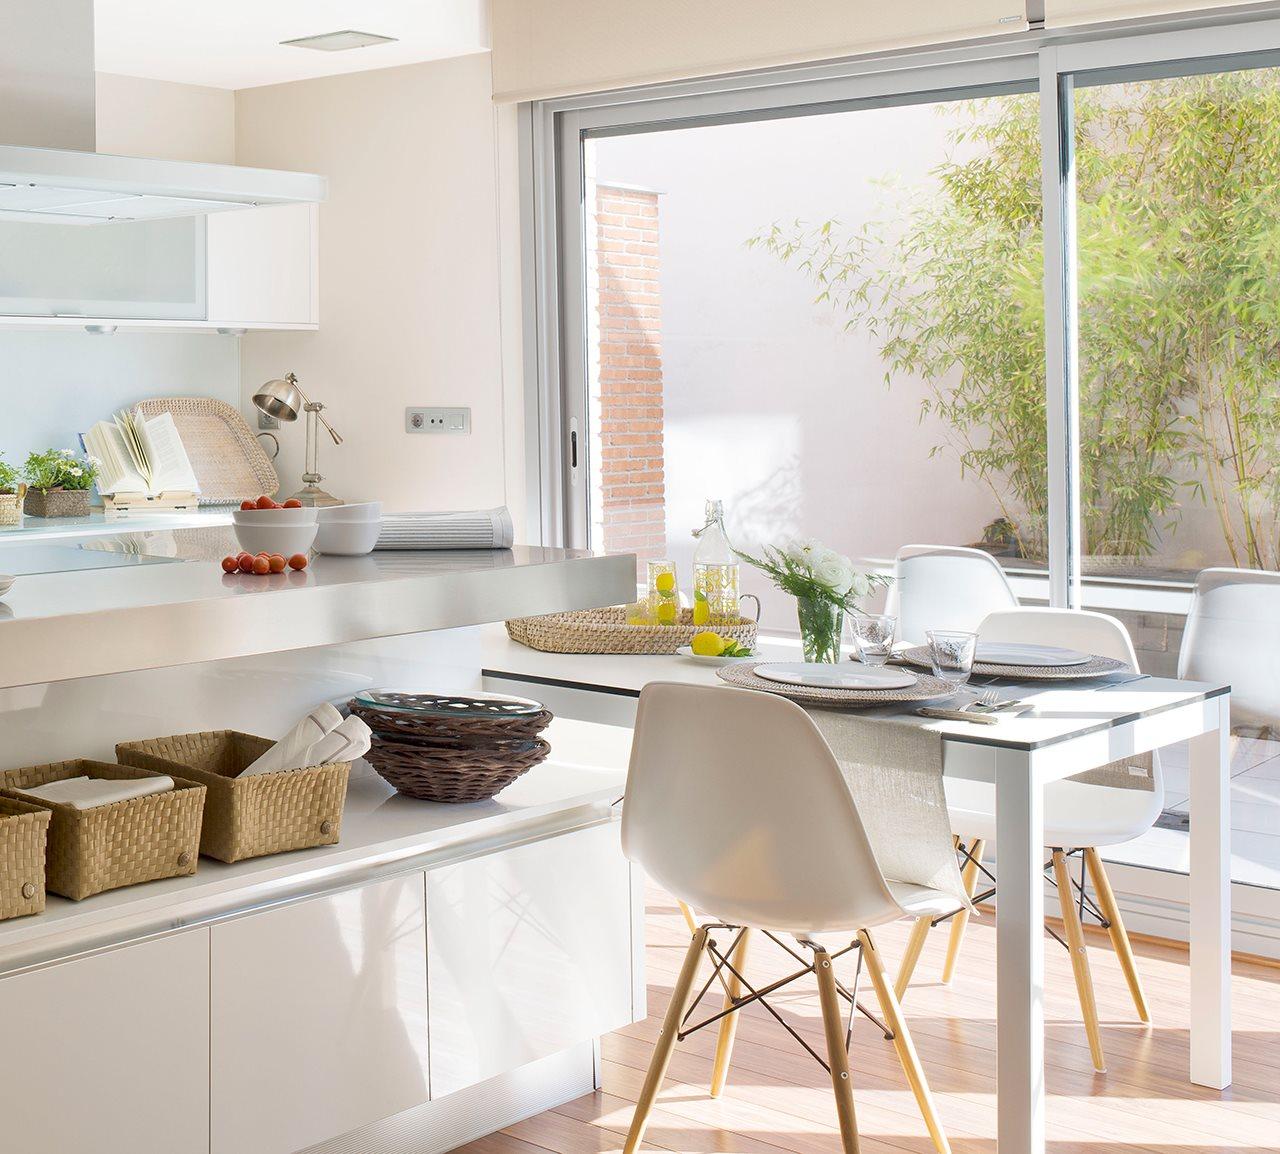 Los 9 mejores dise os de cocinas office for Disenos para cocinas